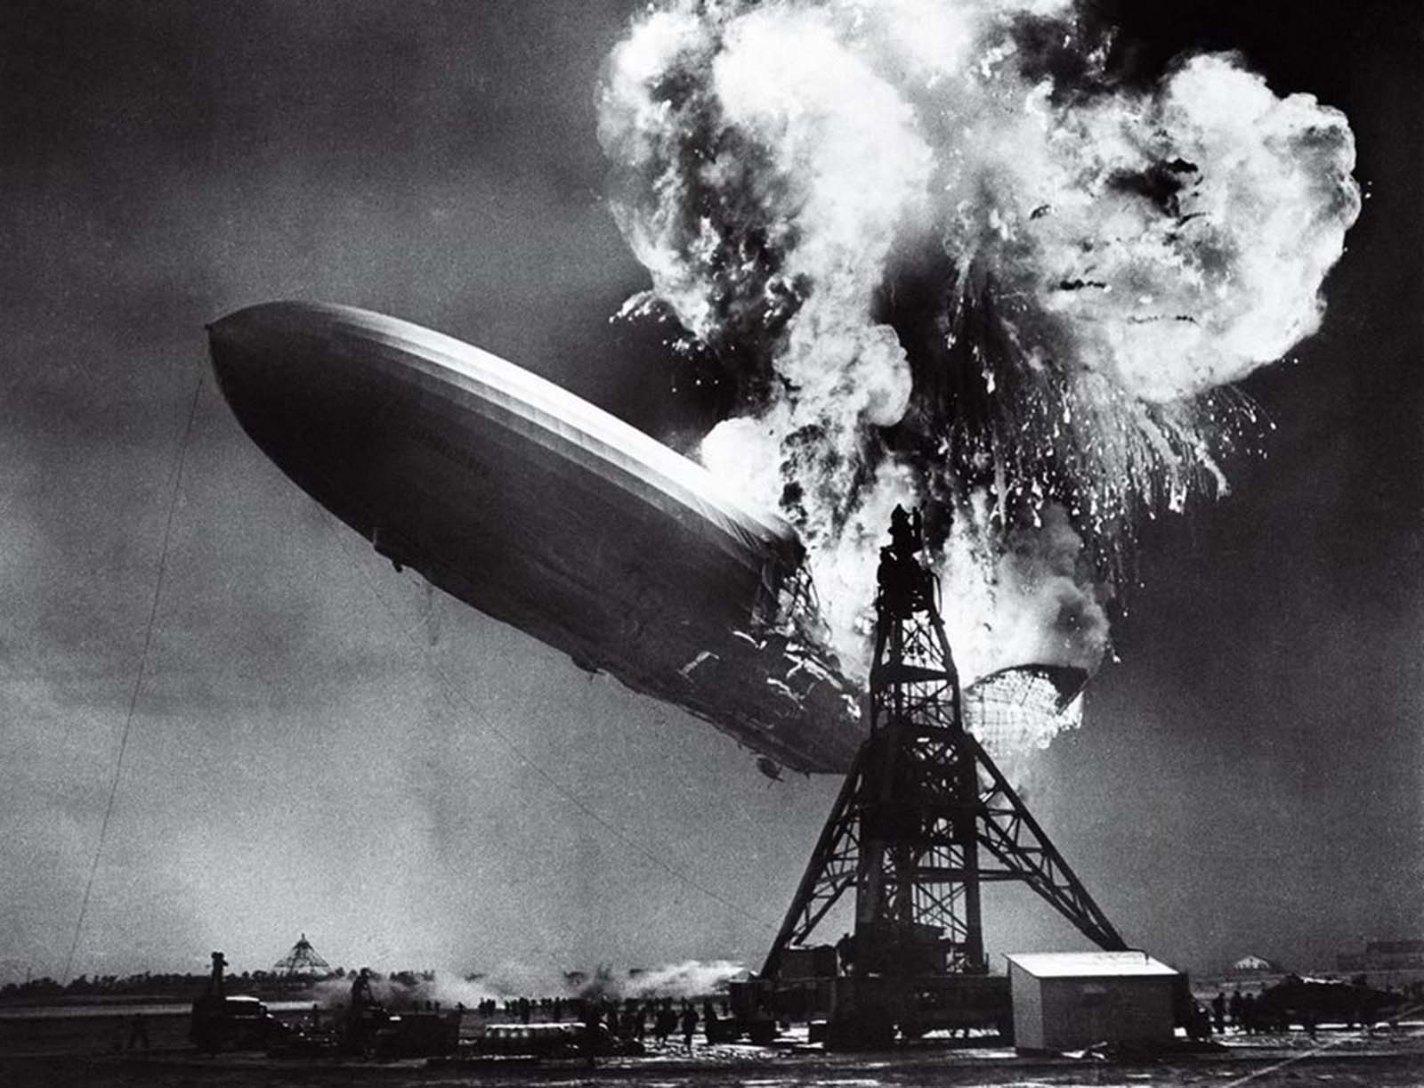 The Hindenburg Disaster, Sam Shere, 1937